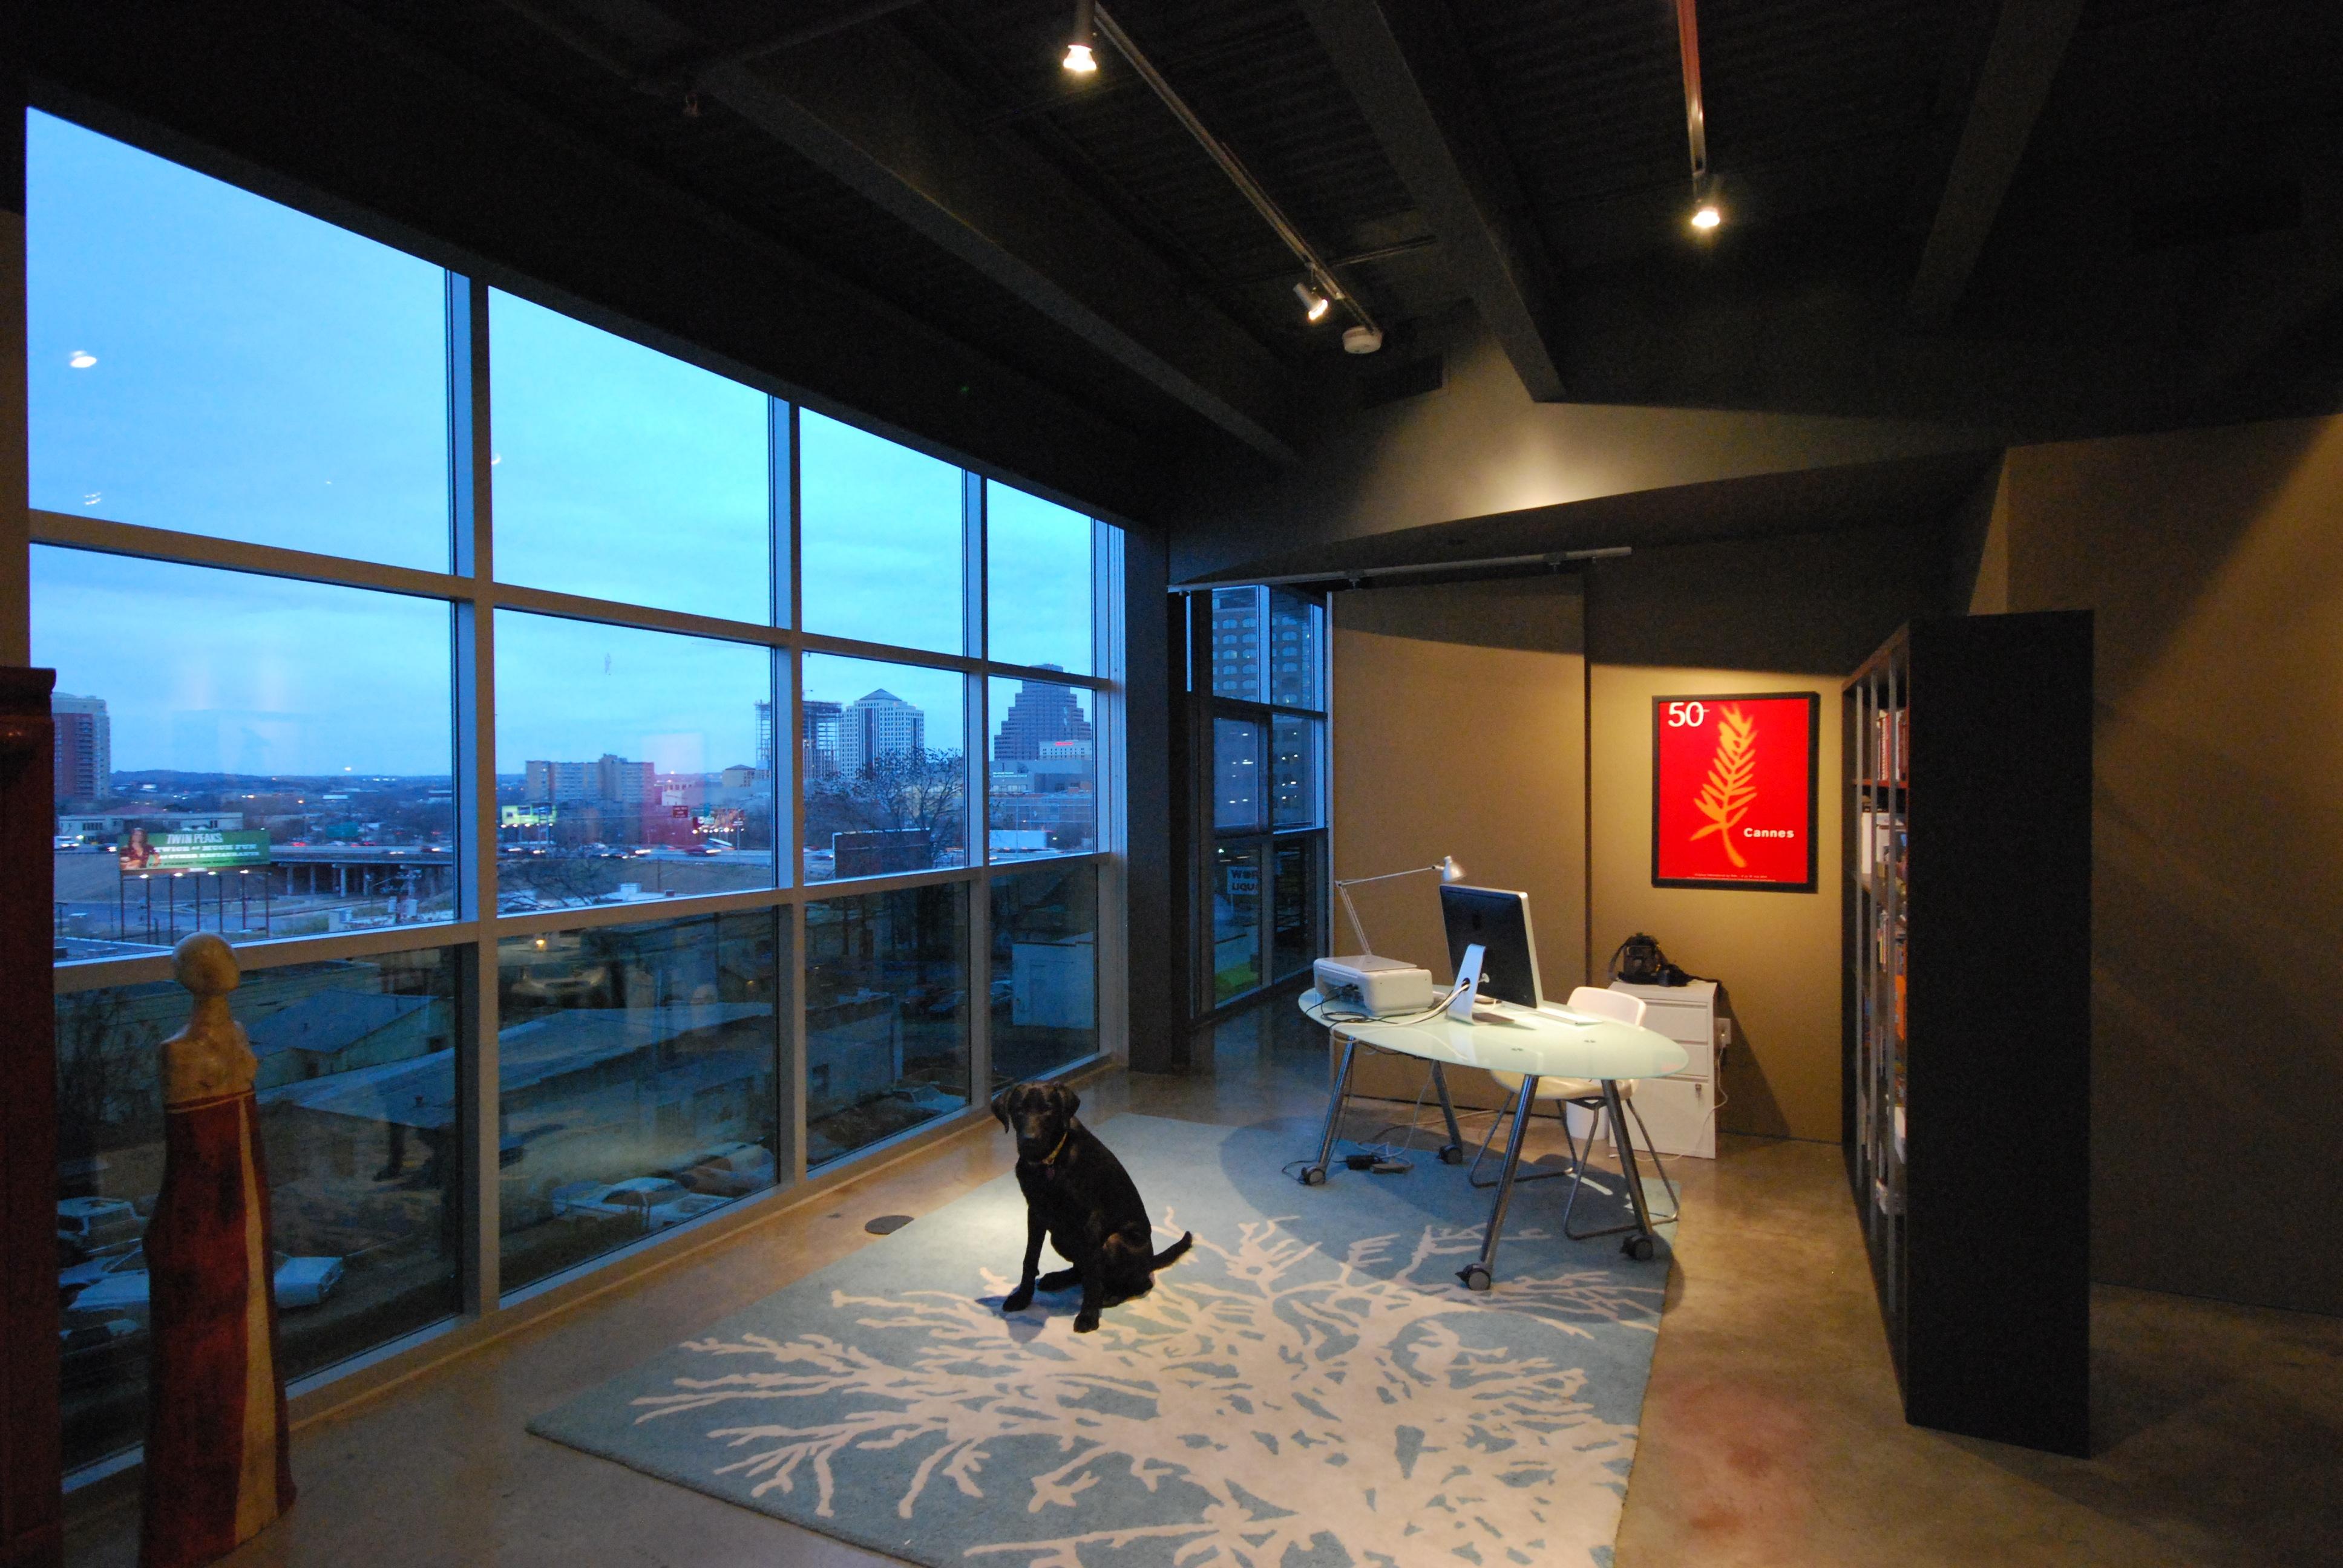 6B_officestudy.jpg